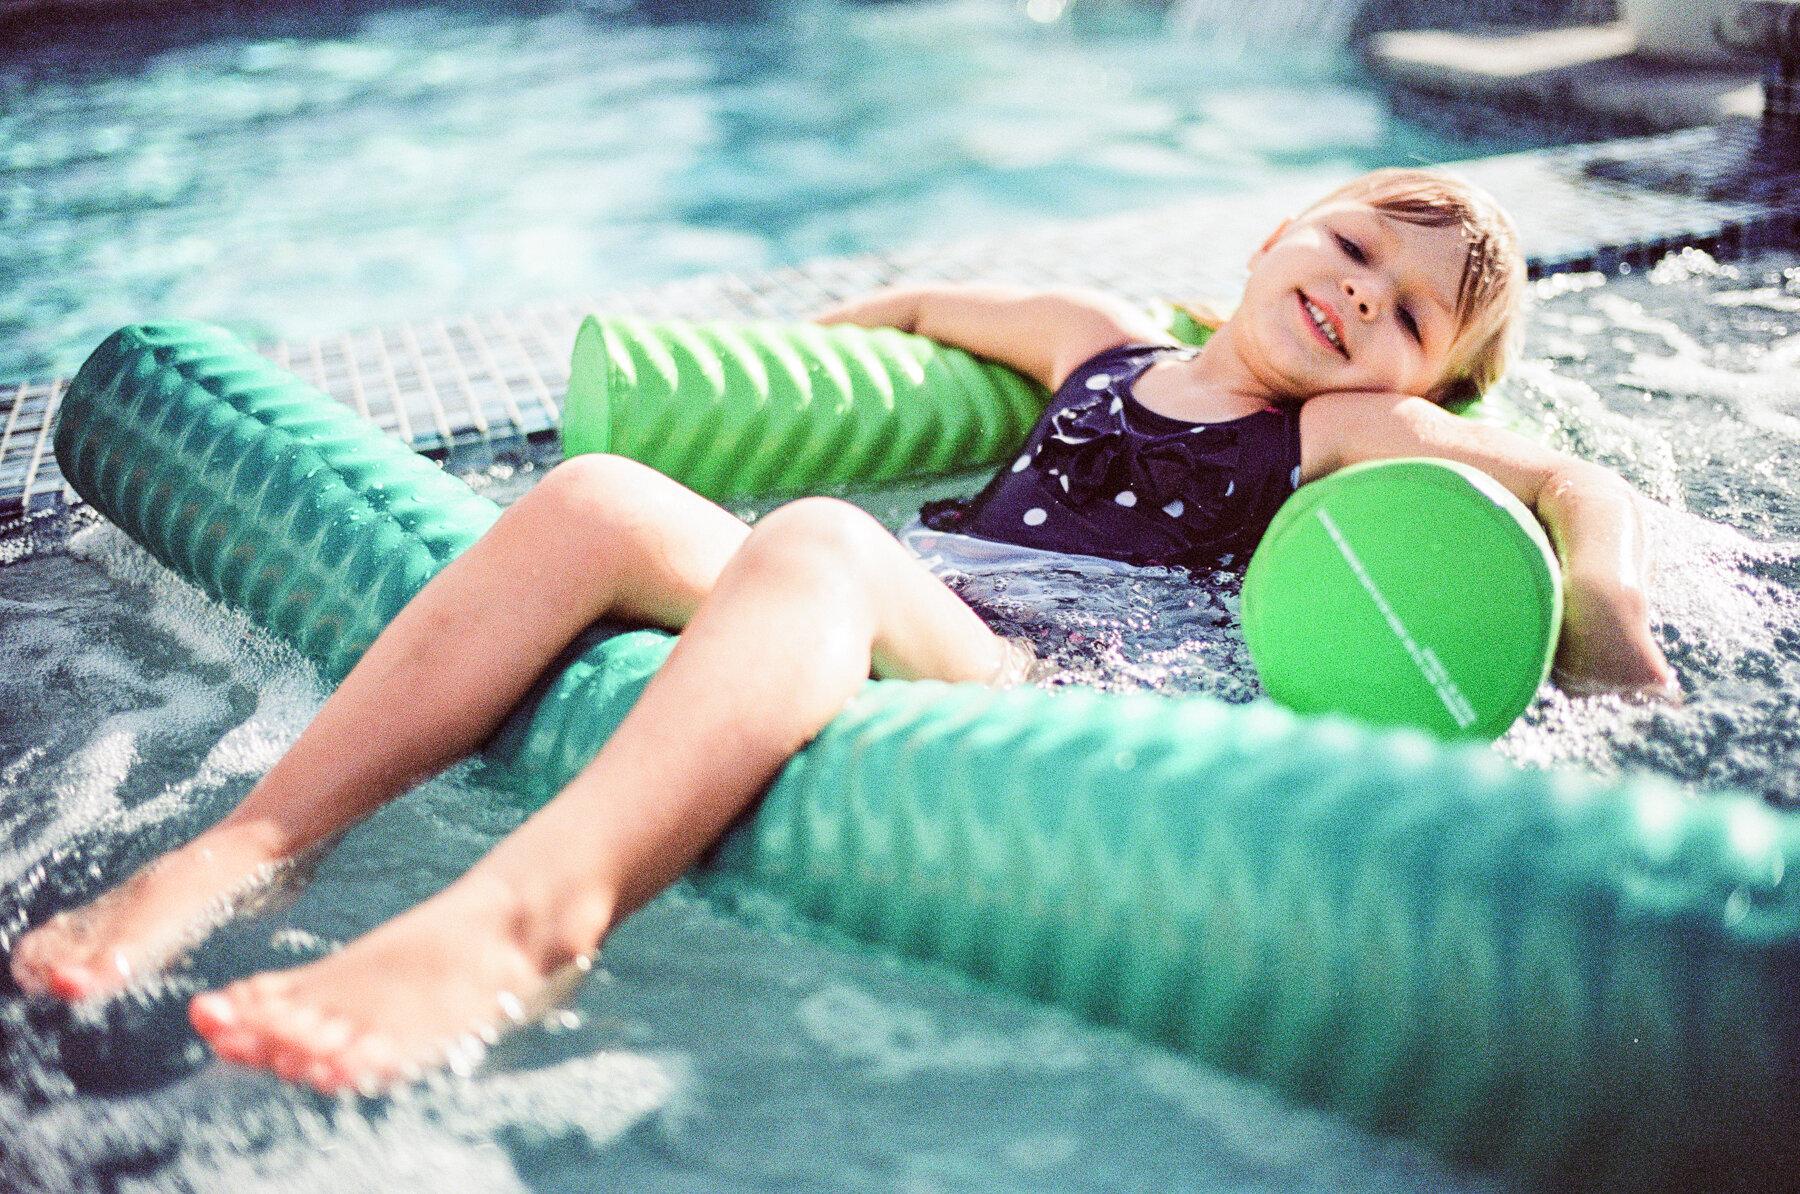 Leica-M6-Pool-Chloe-6.jpg